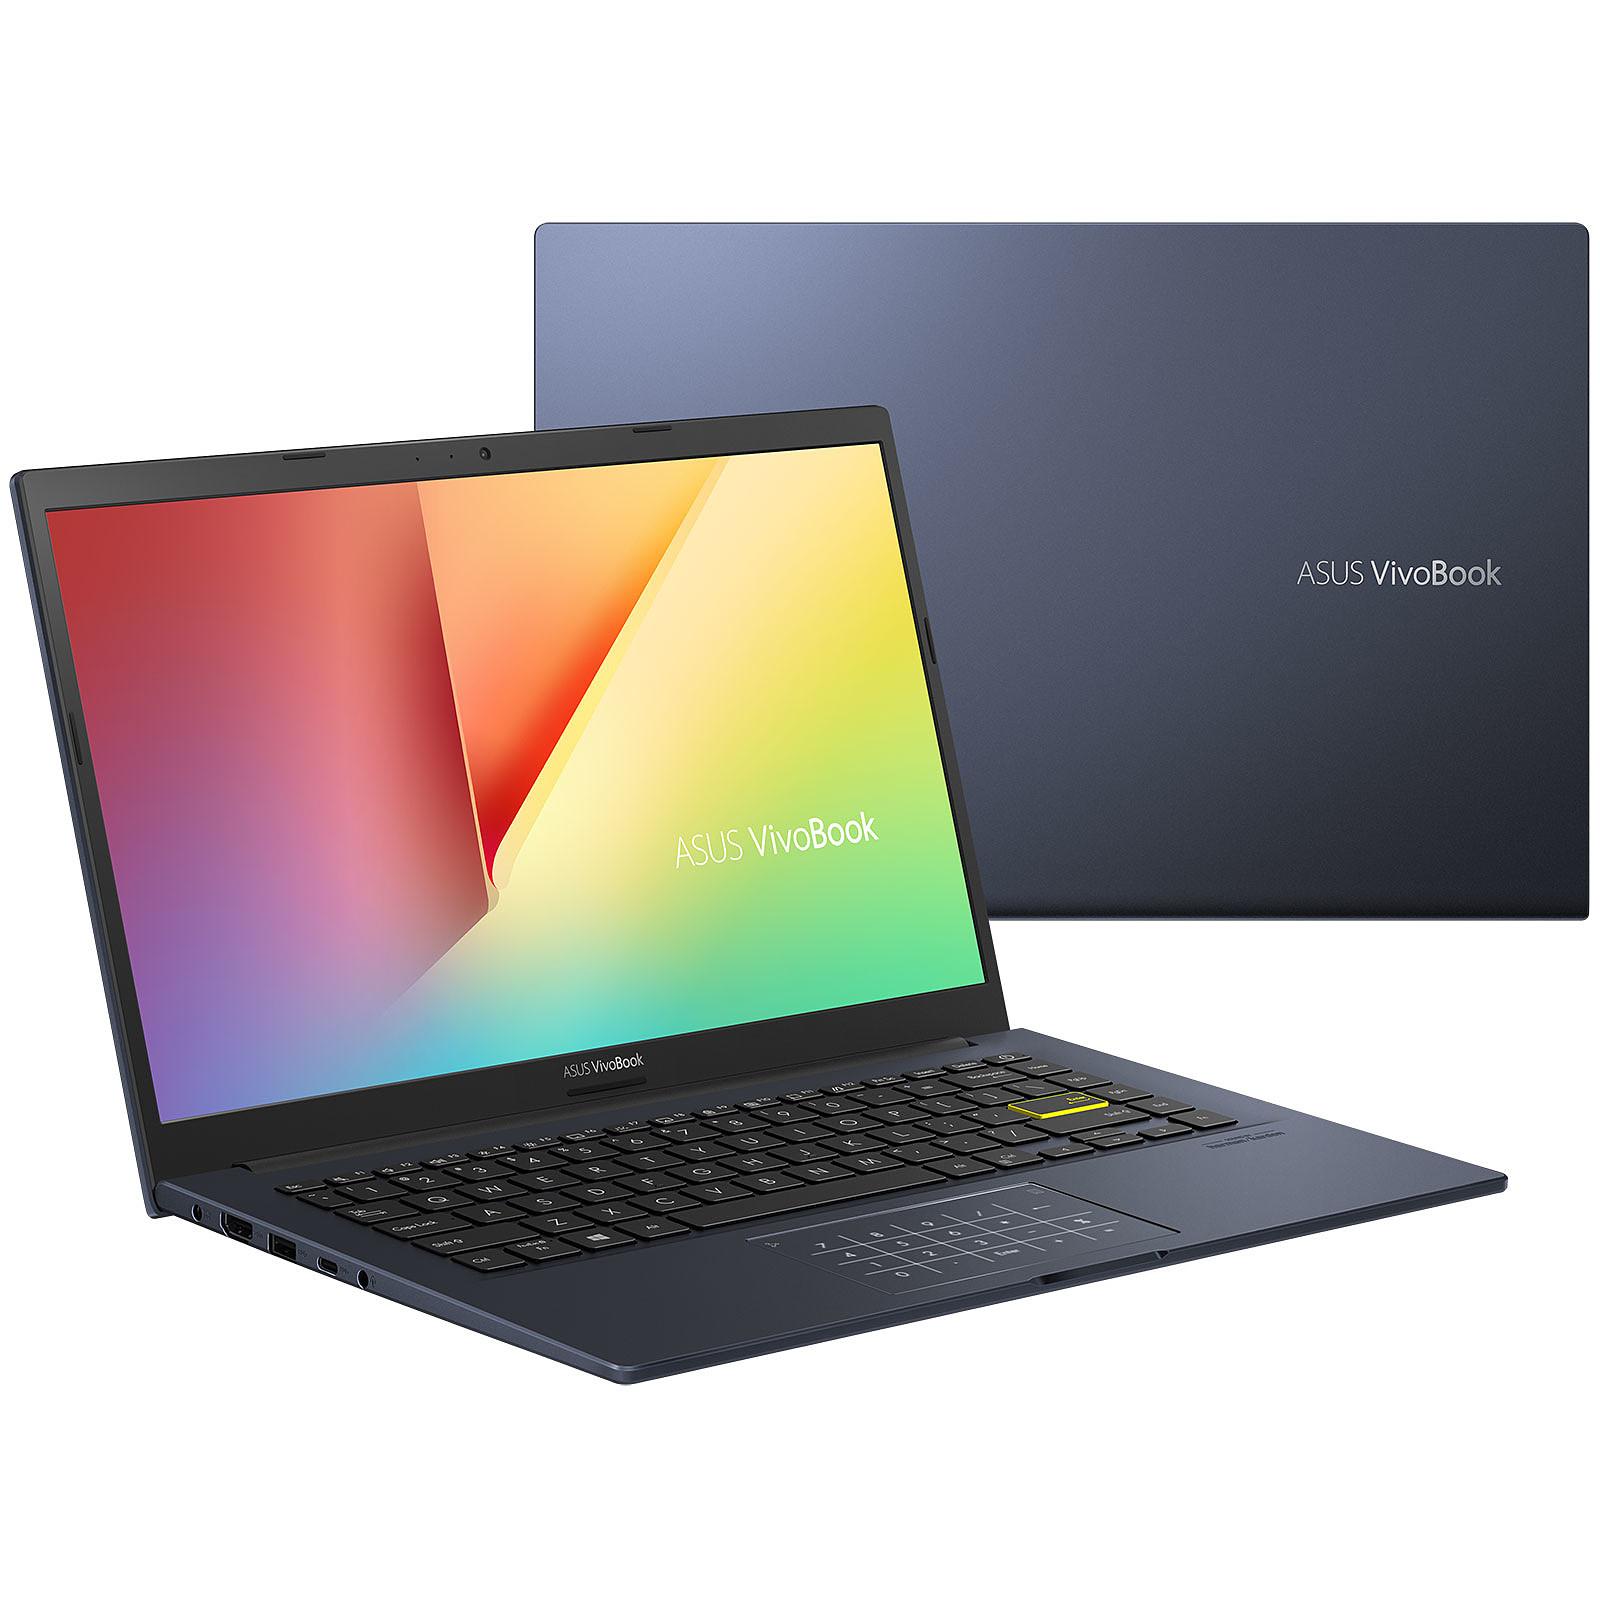 ASUS Vivobook S14 S413DA-EK089T avec NumPad